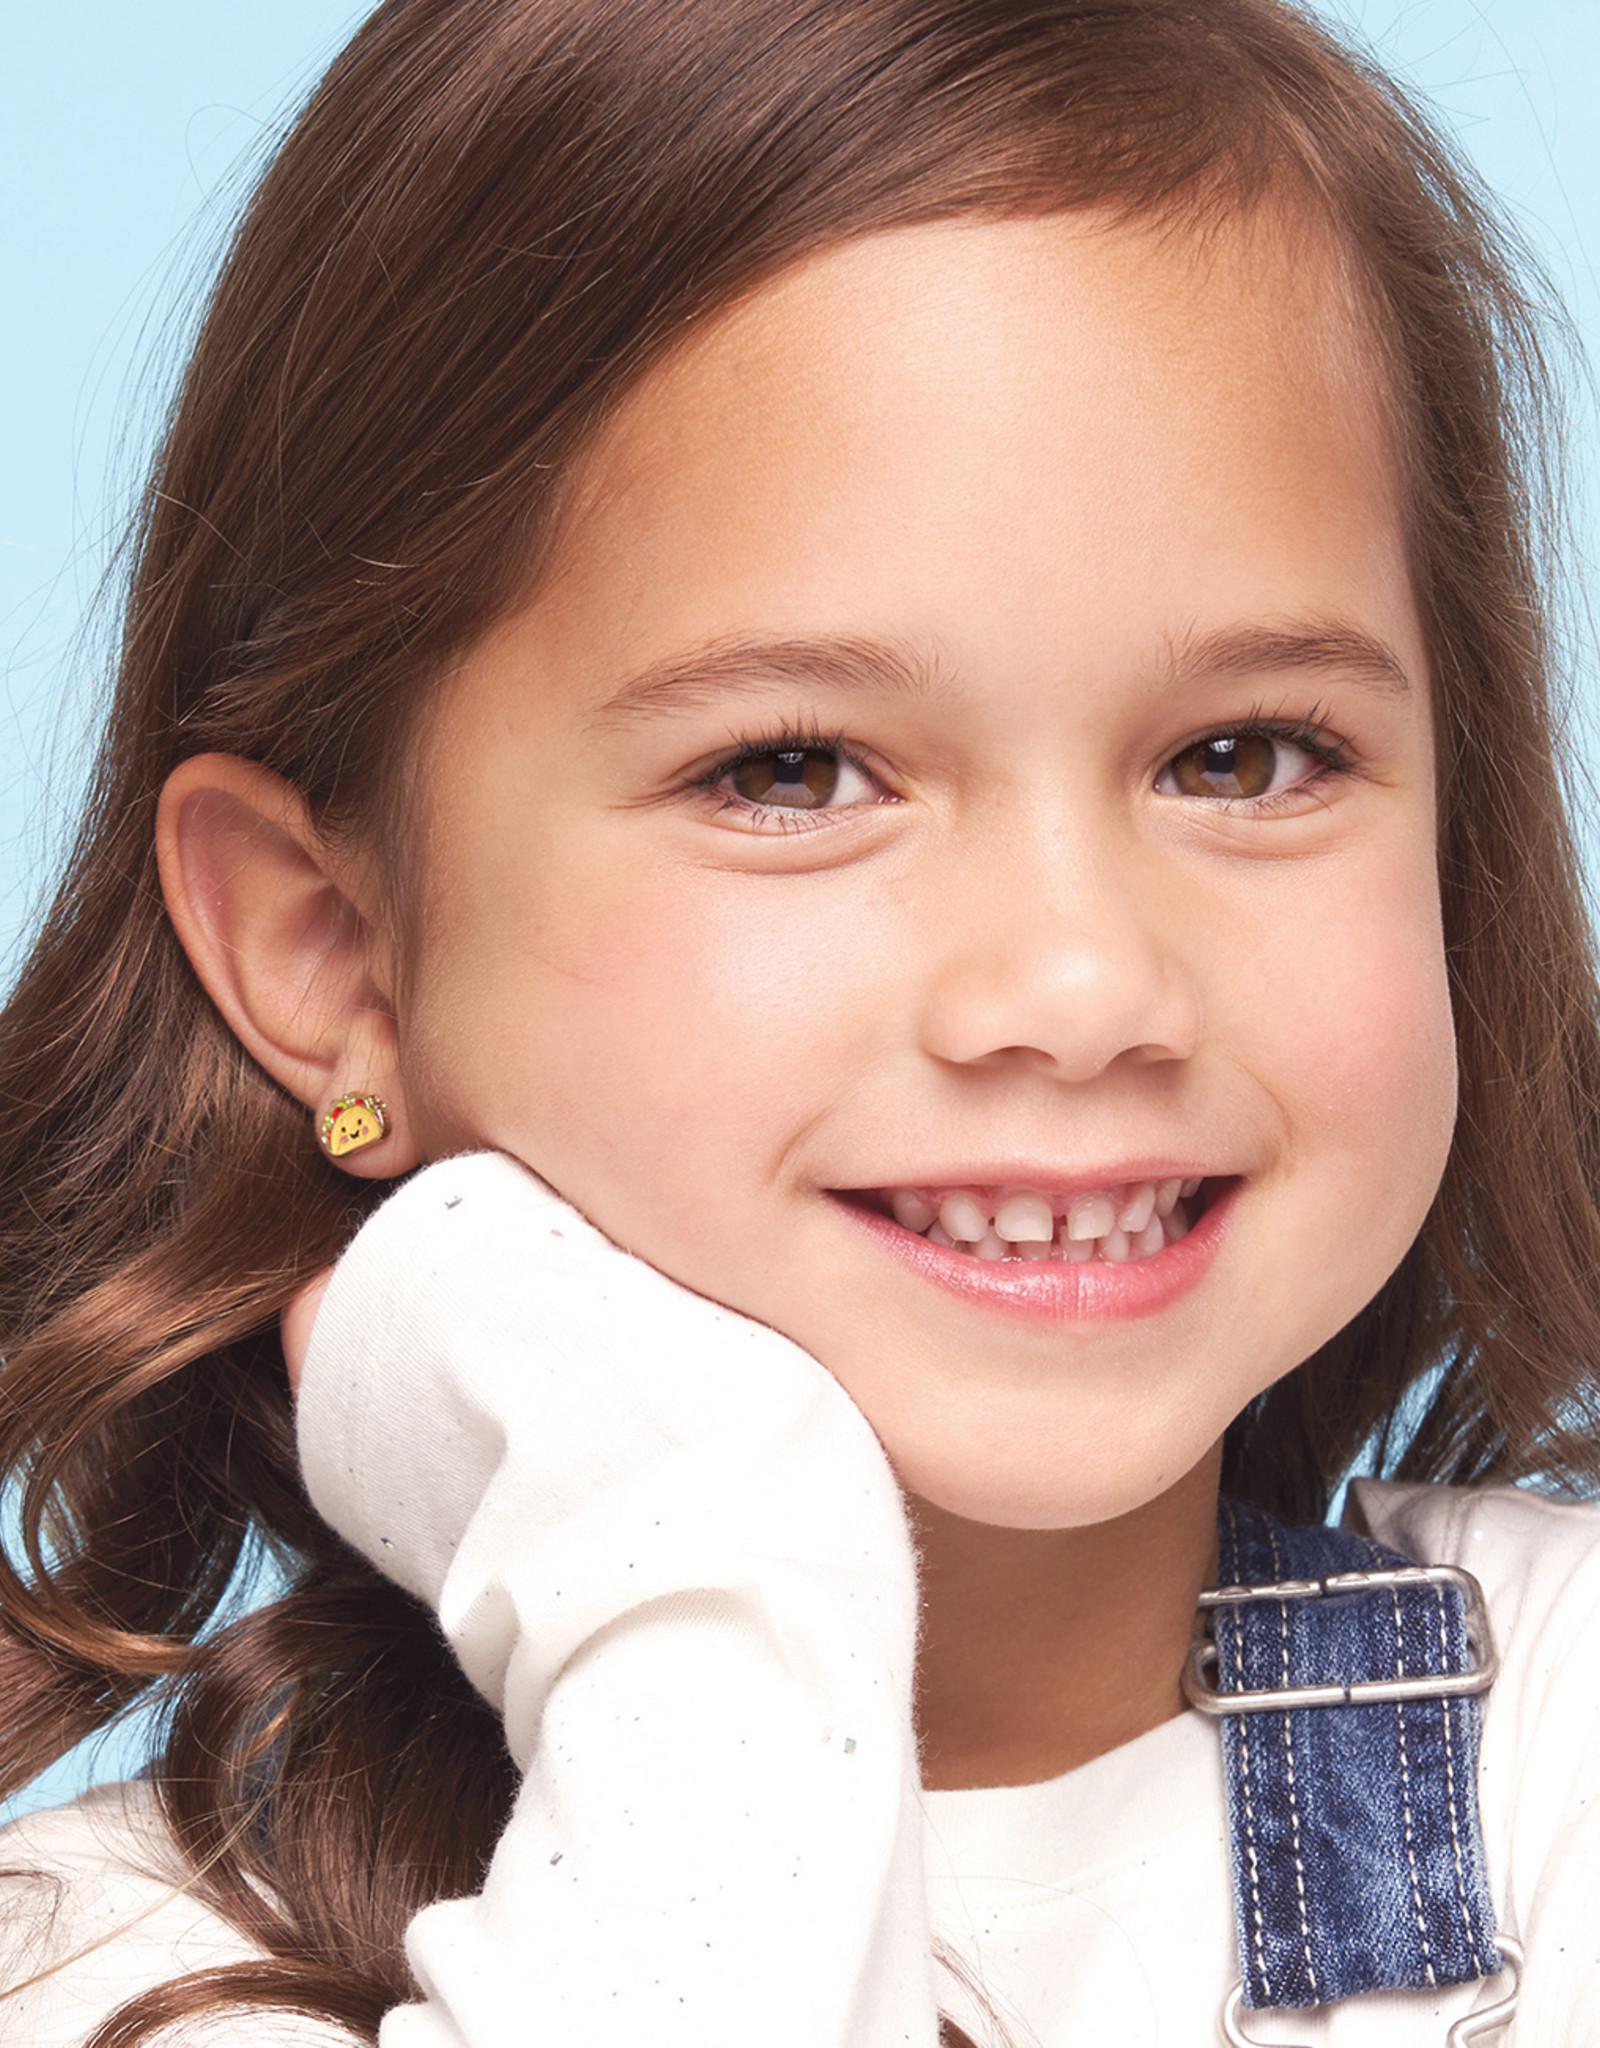 Girl Nation Assortiment de 6 boucles d'oreilles en émail - Ballerine